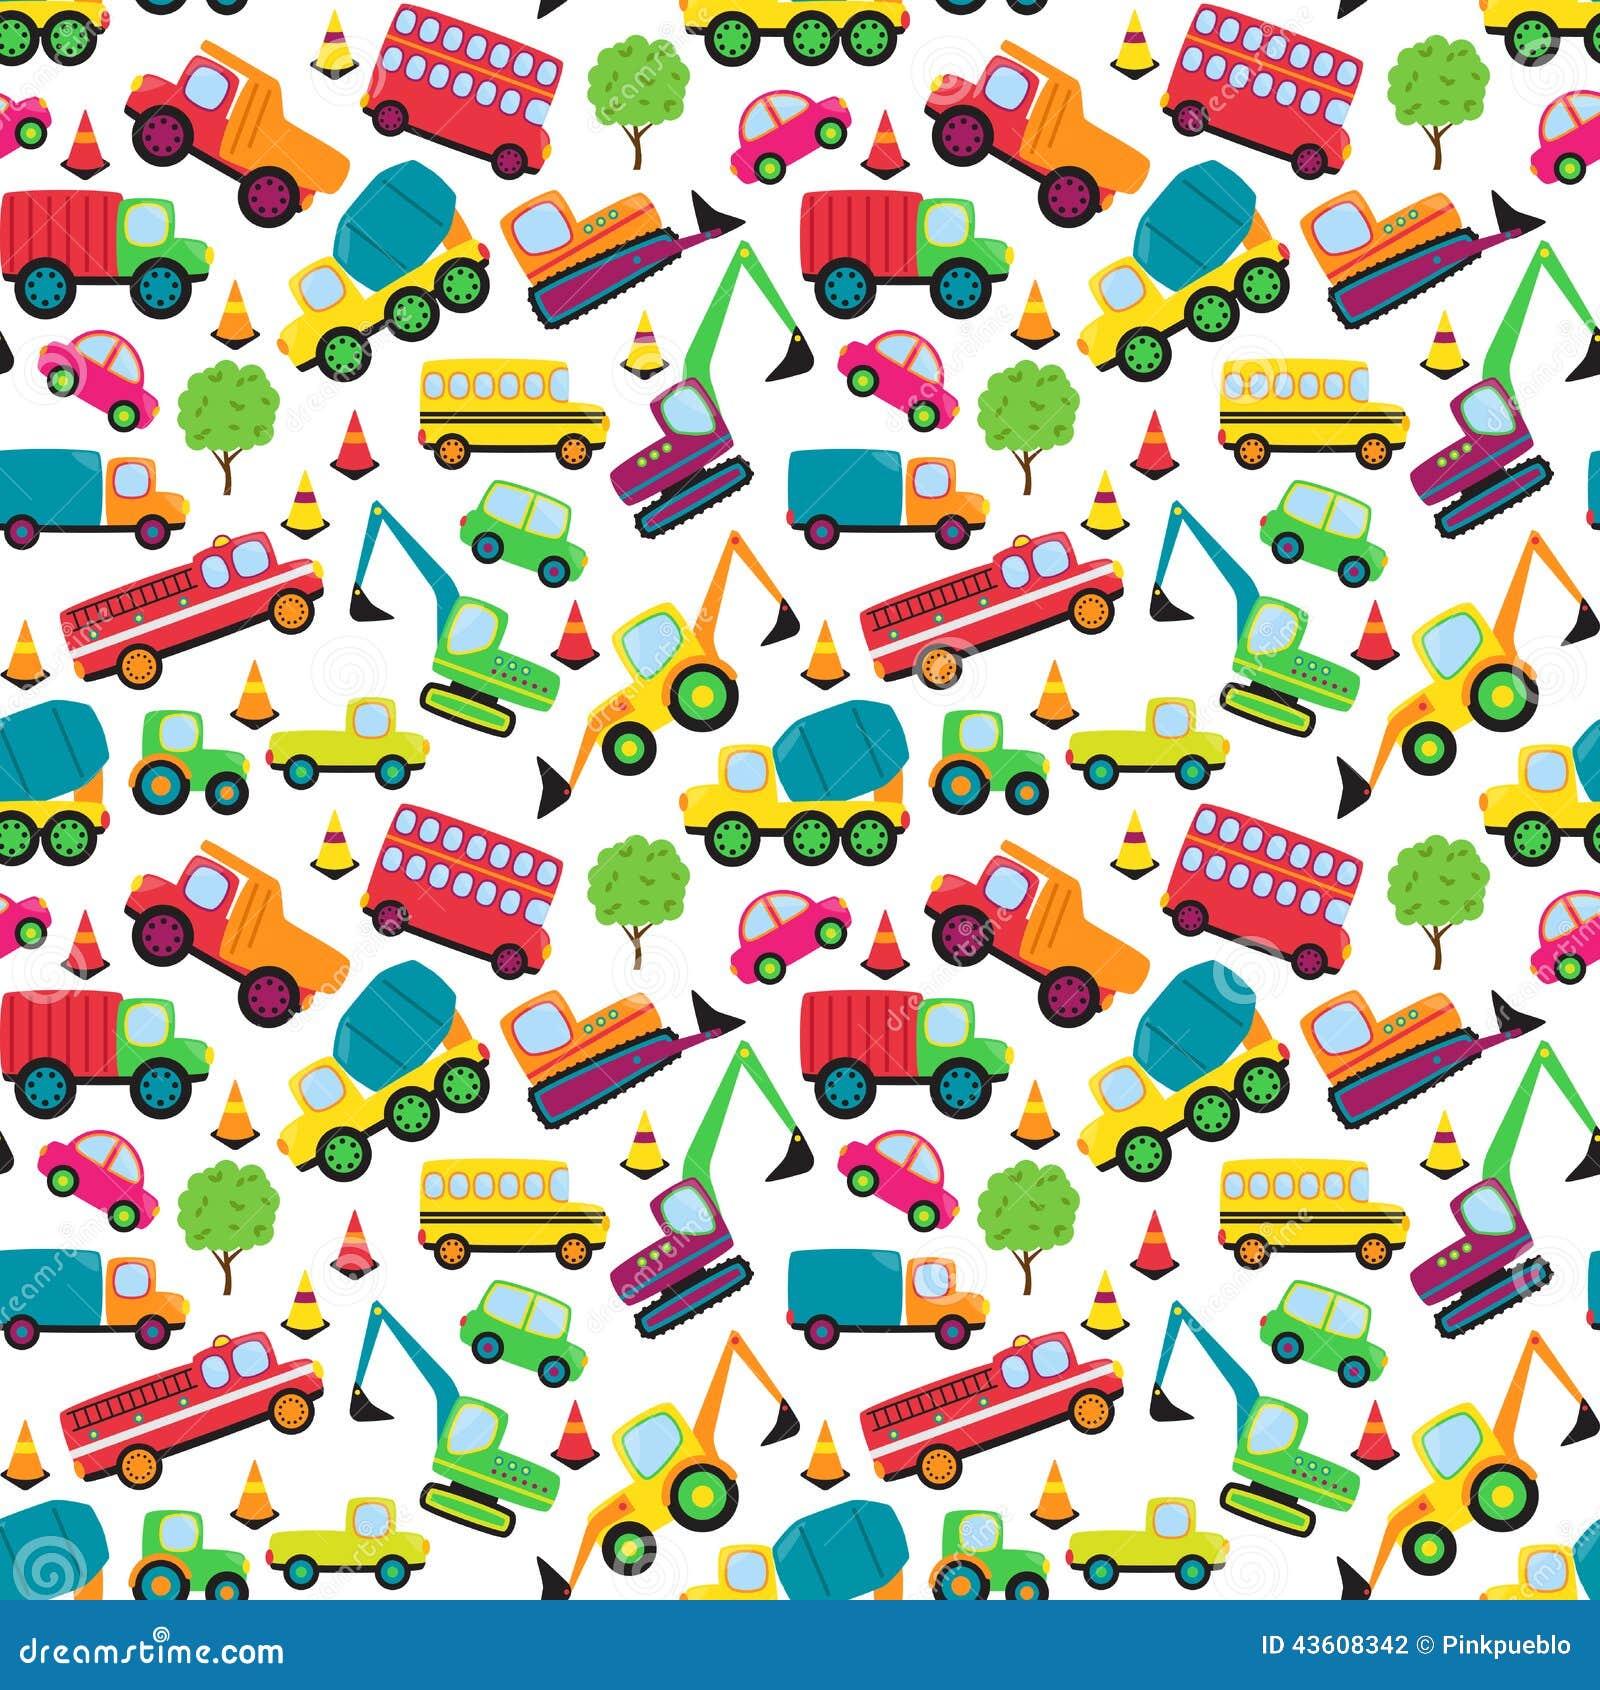 Transportation Themed Seamless Tileable Background Pattern